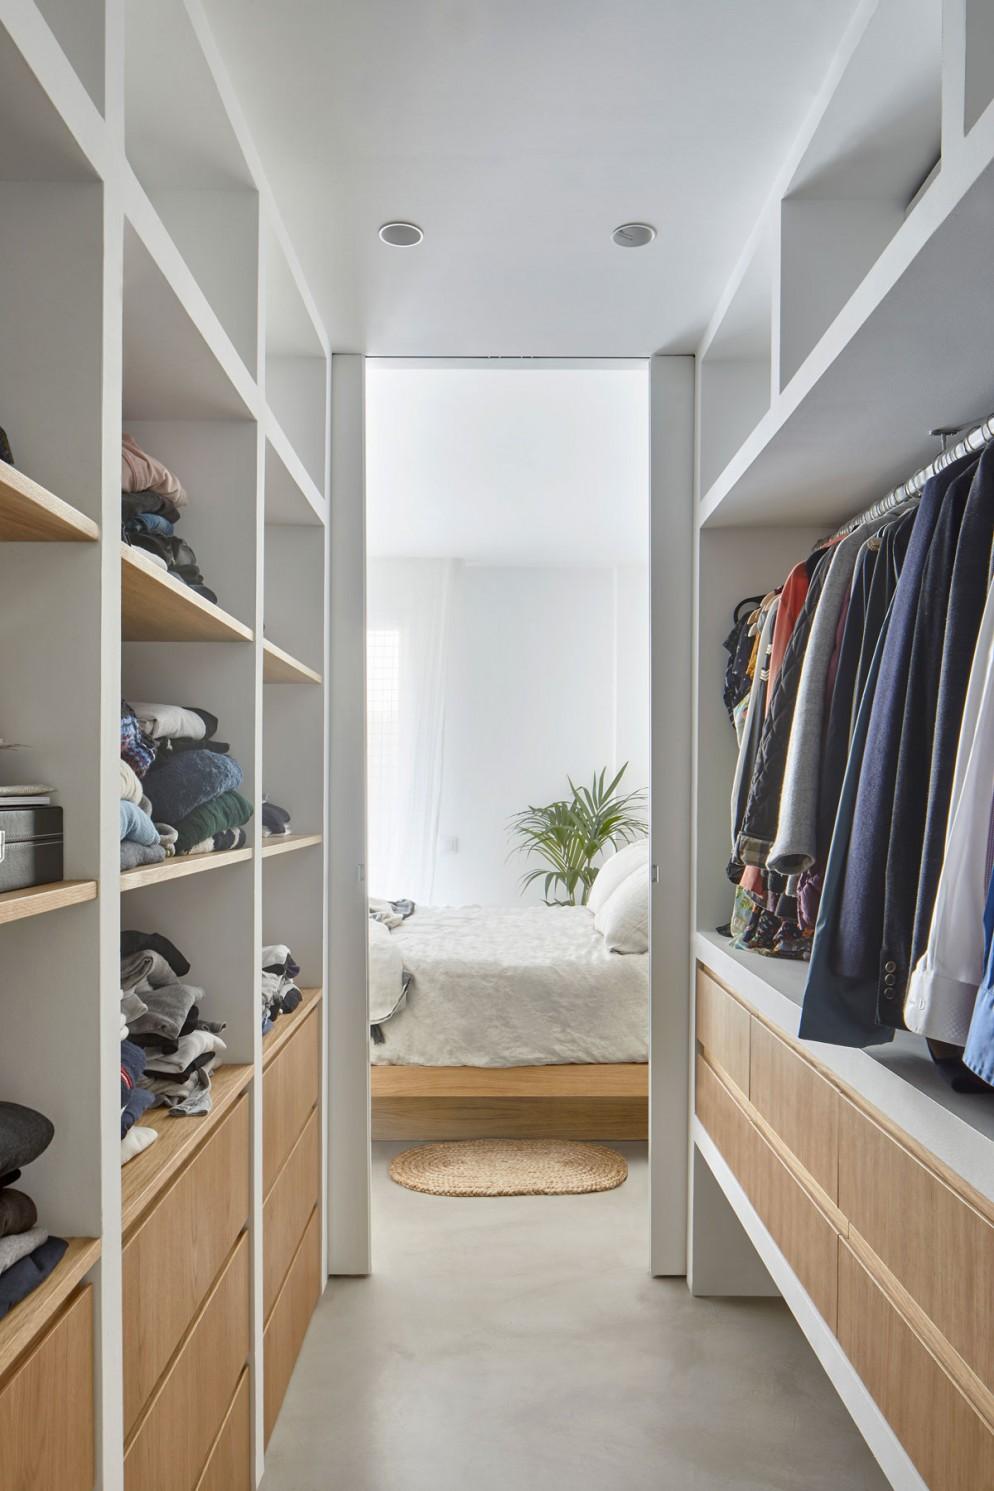 cabine armadio idee